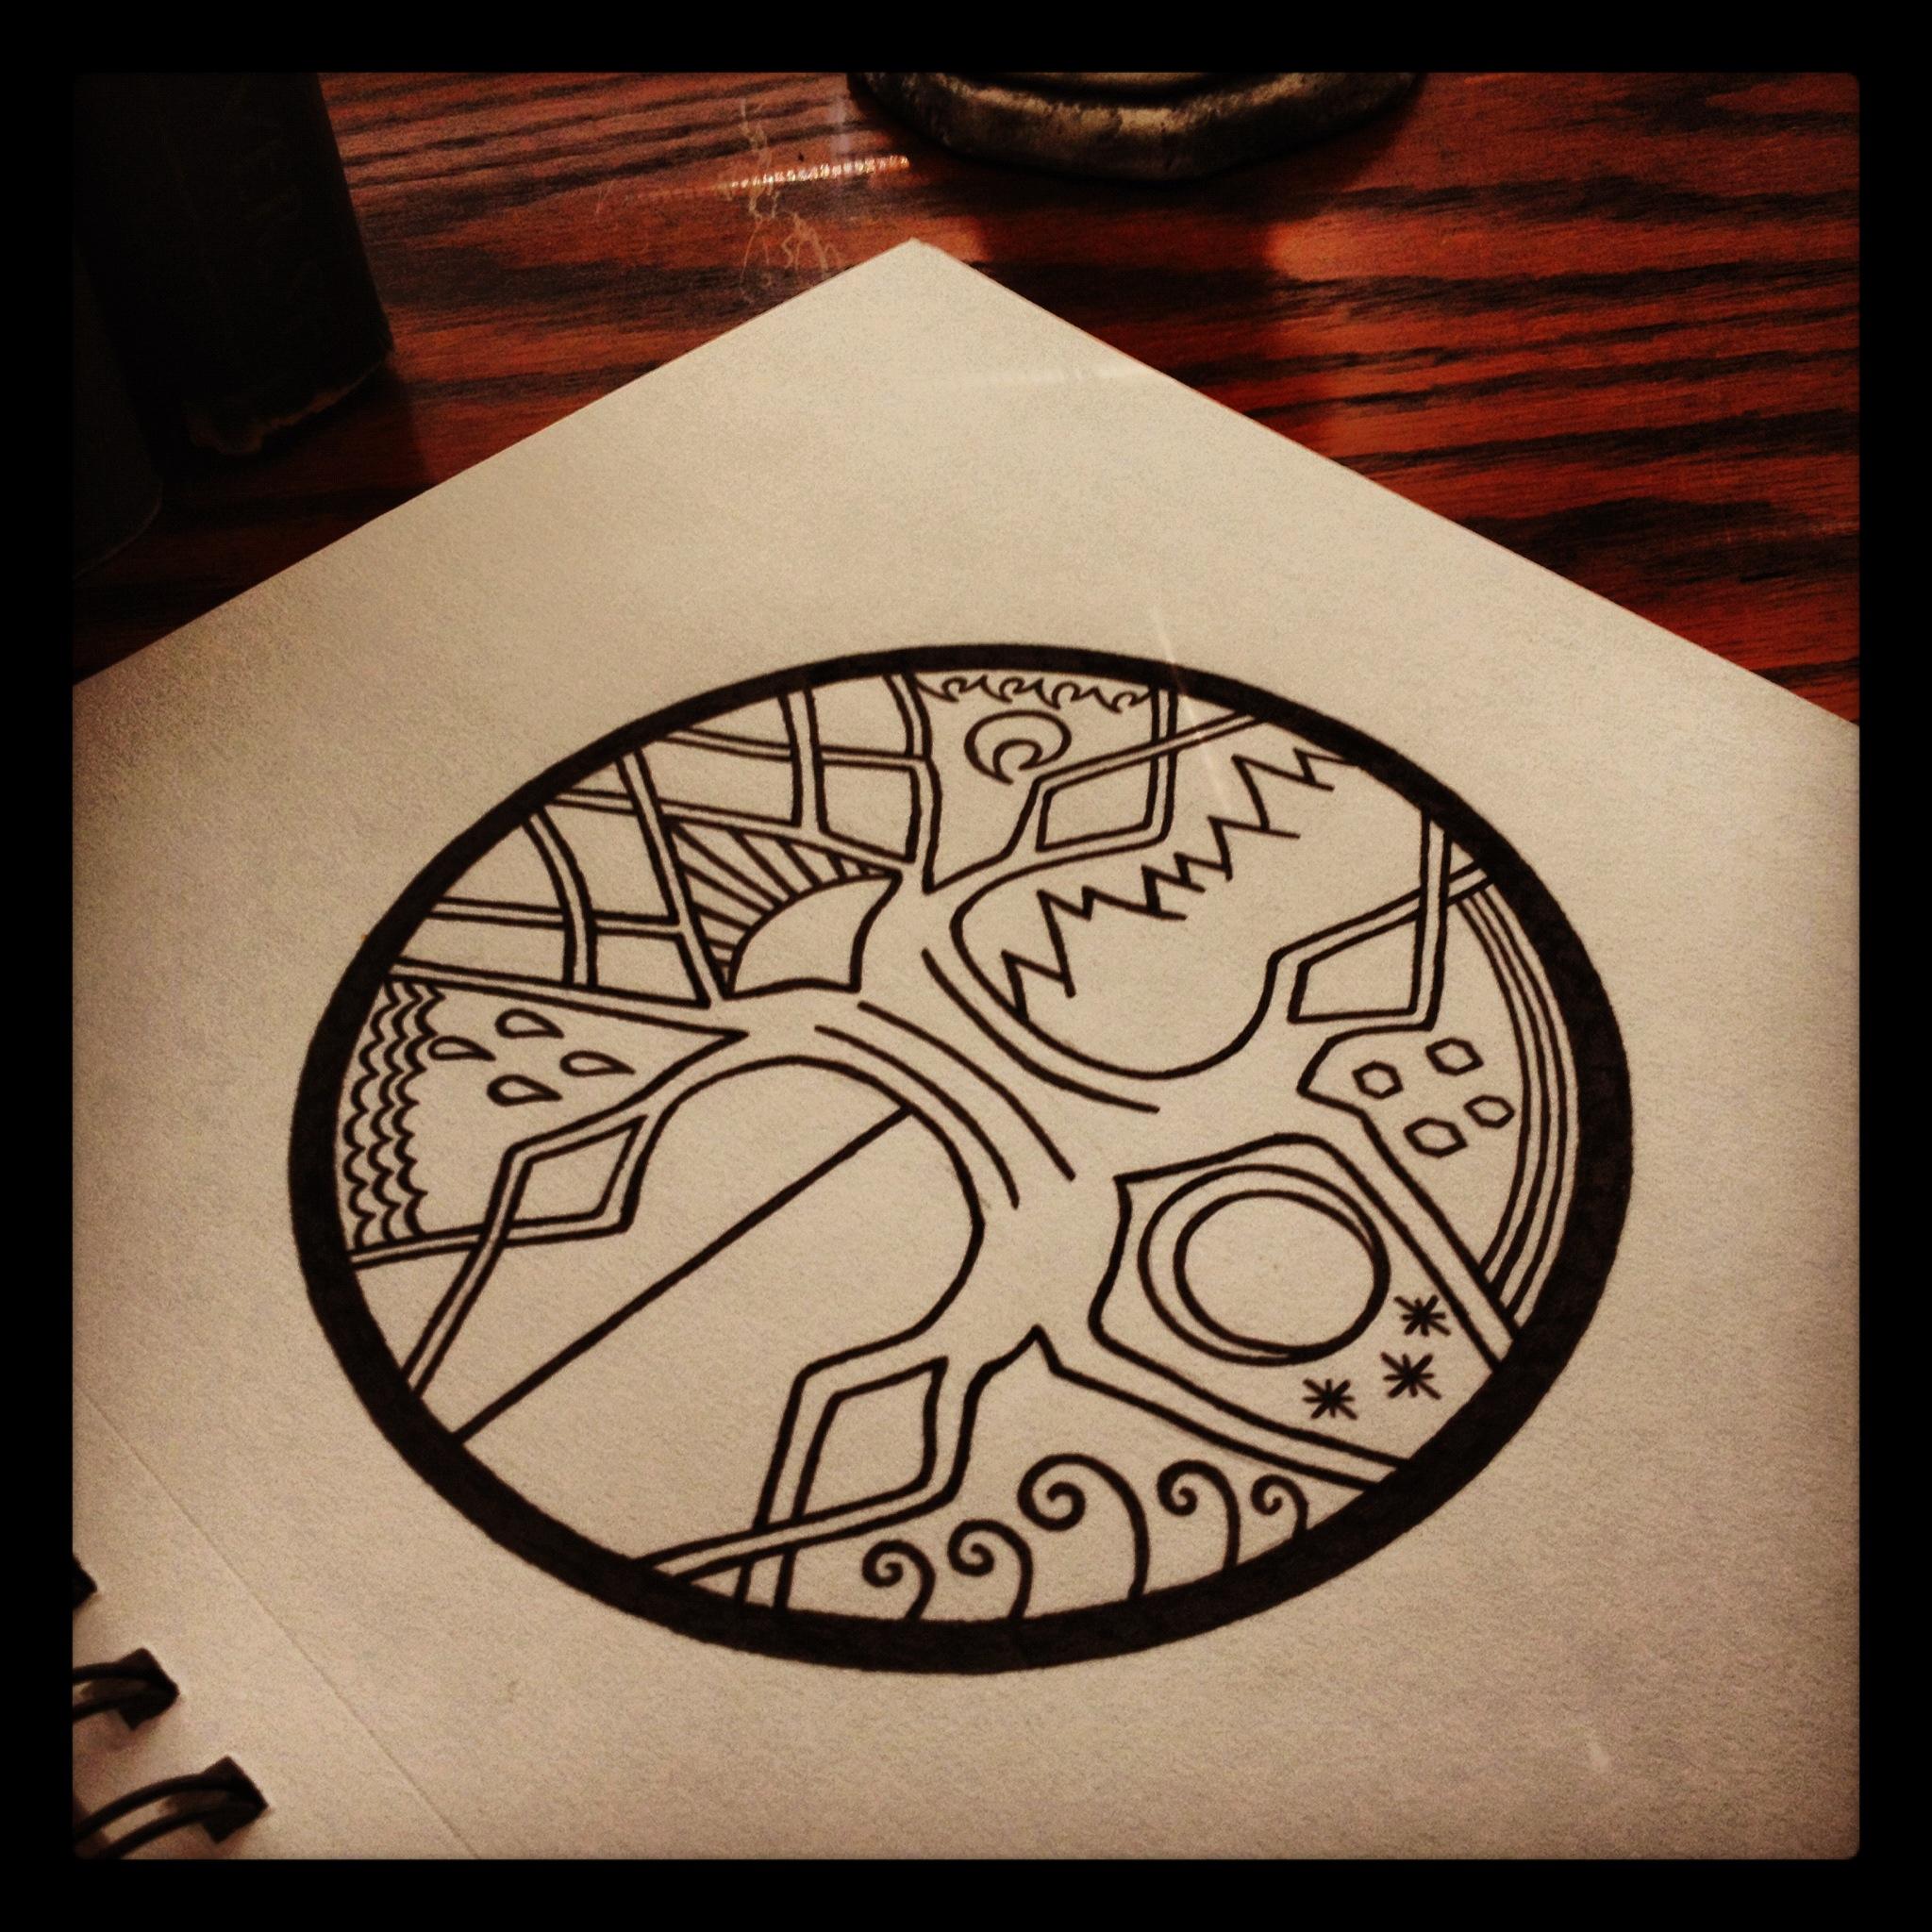 The Kyla symbol